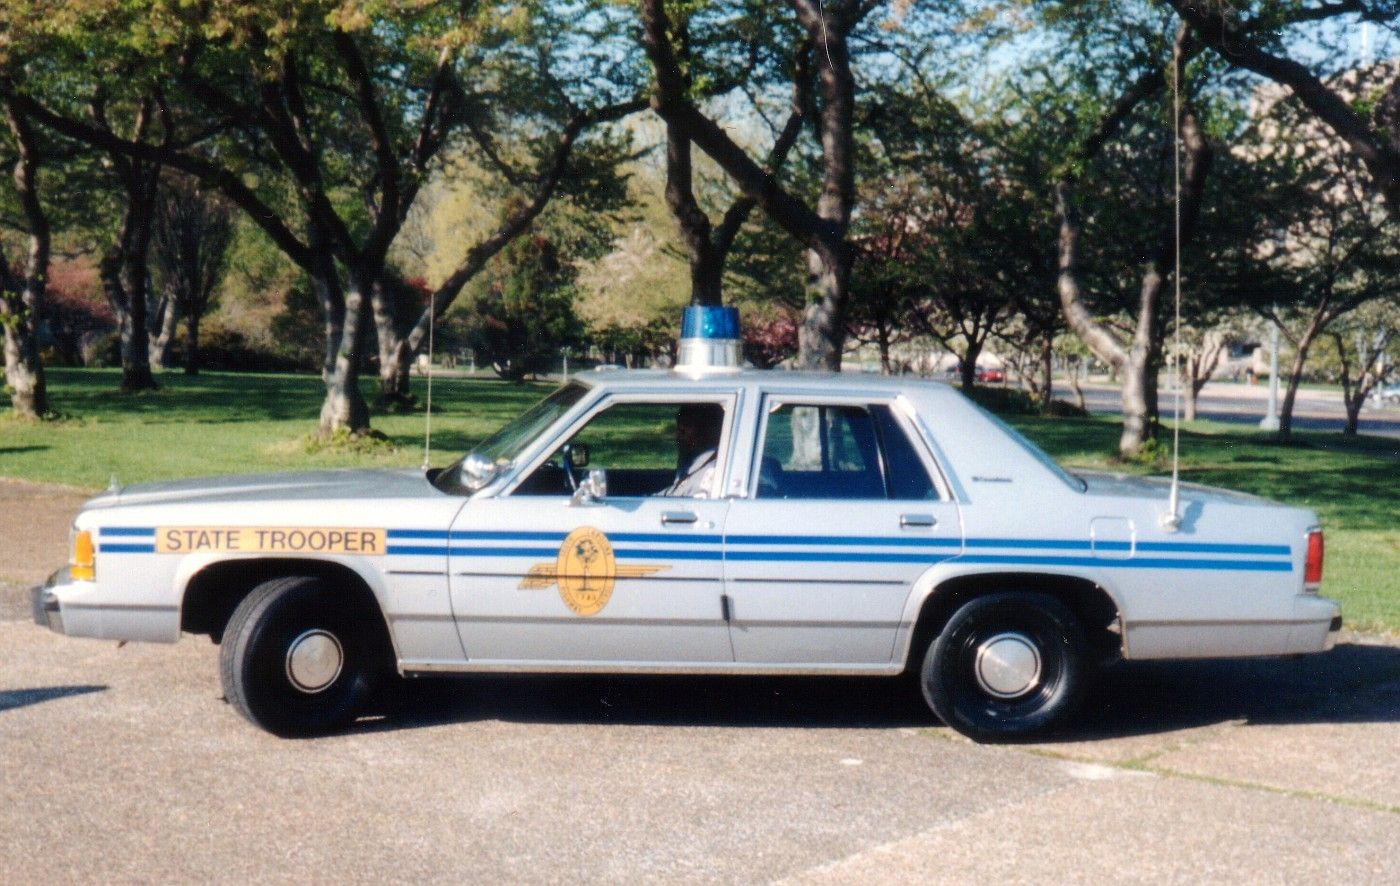 South Carolina Highway Patrol South Carolina Highway Patrol Police Cars Old Police Cars